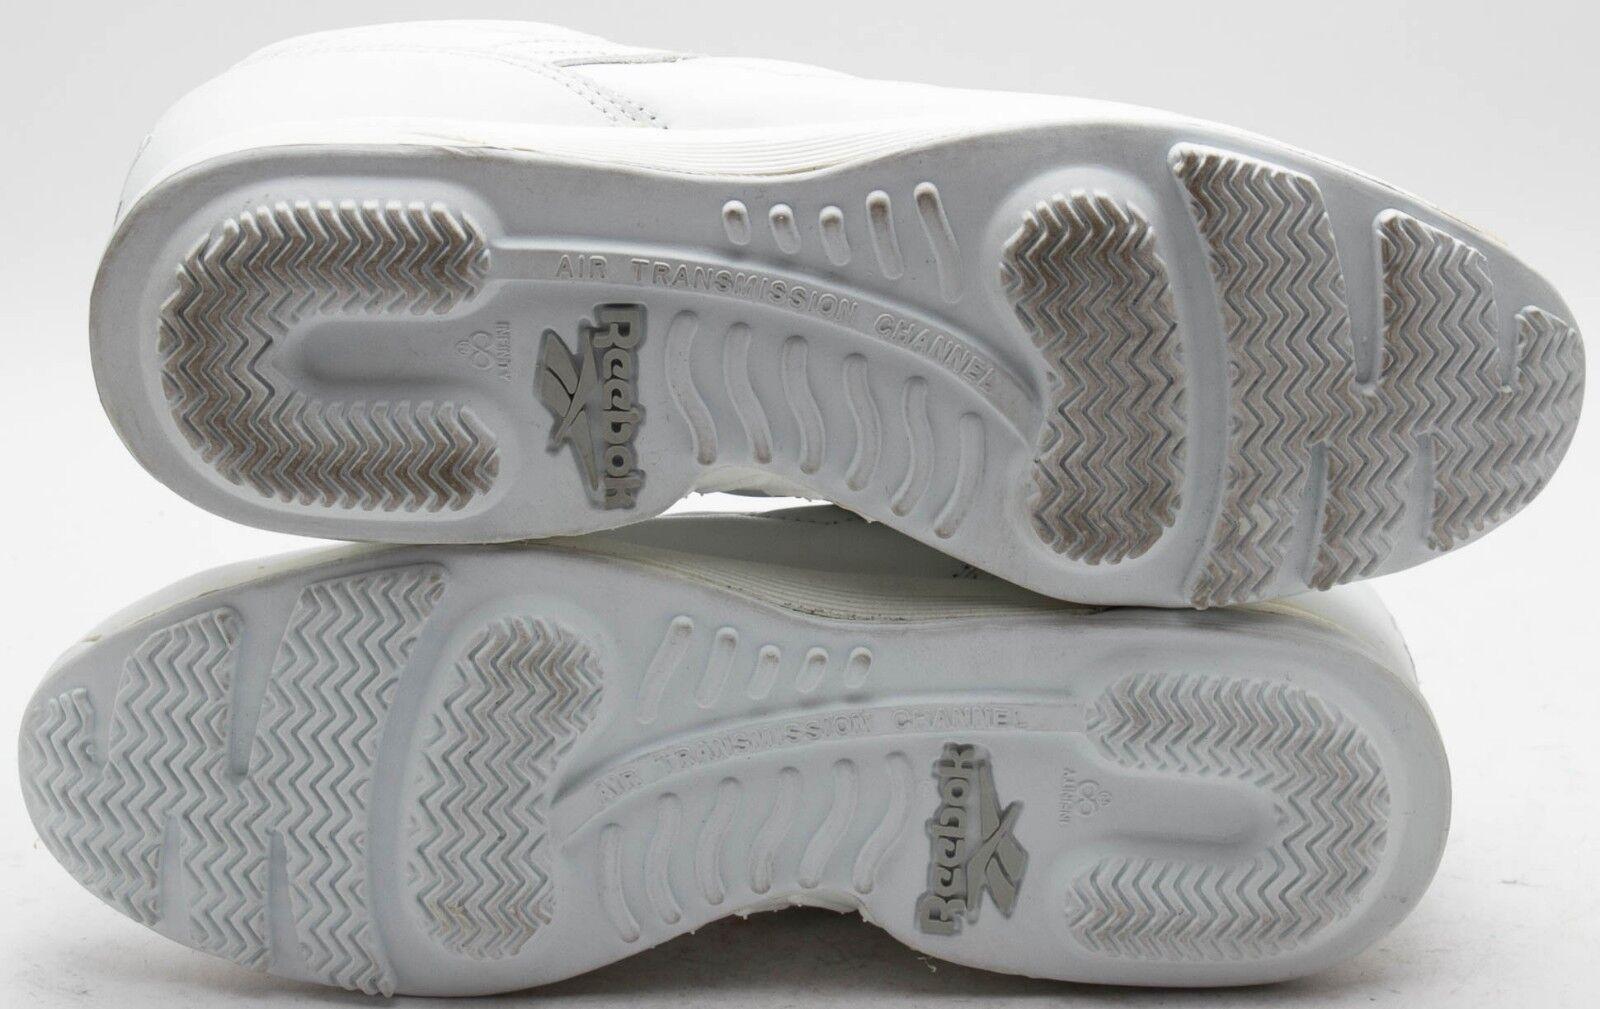 Reebok Donna  Vintage 1994 Comfort Glide Supreme scarpe scarpe scarpe 11-21158 bianca sz. 6.5 54be43